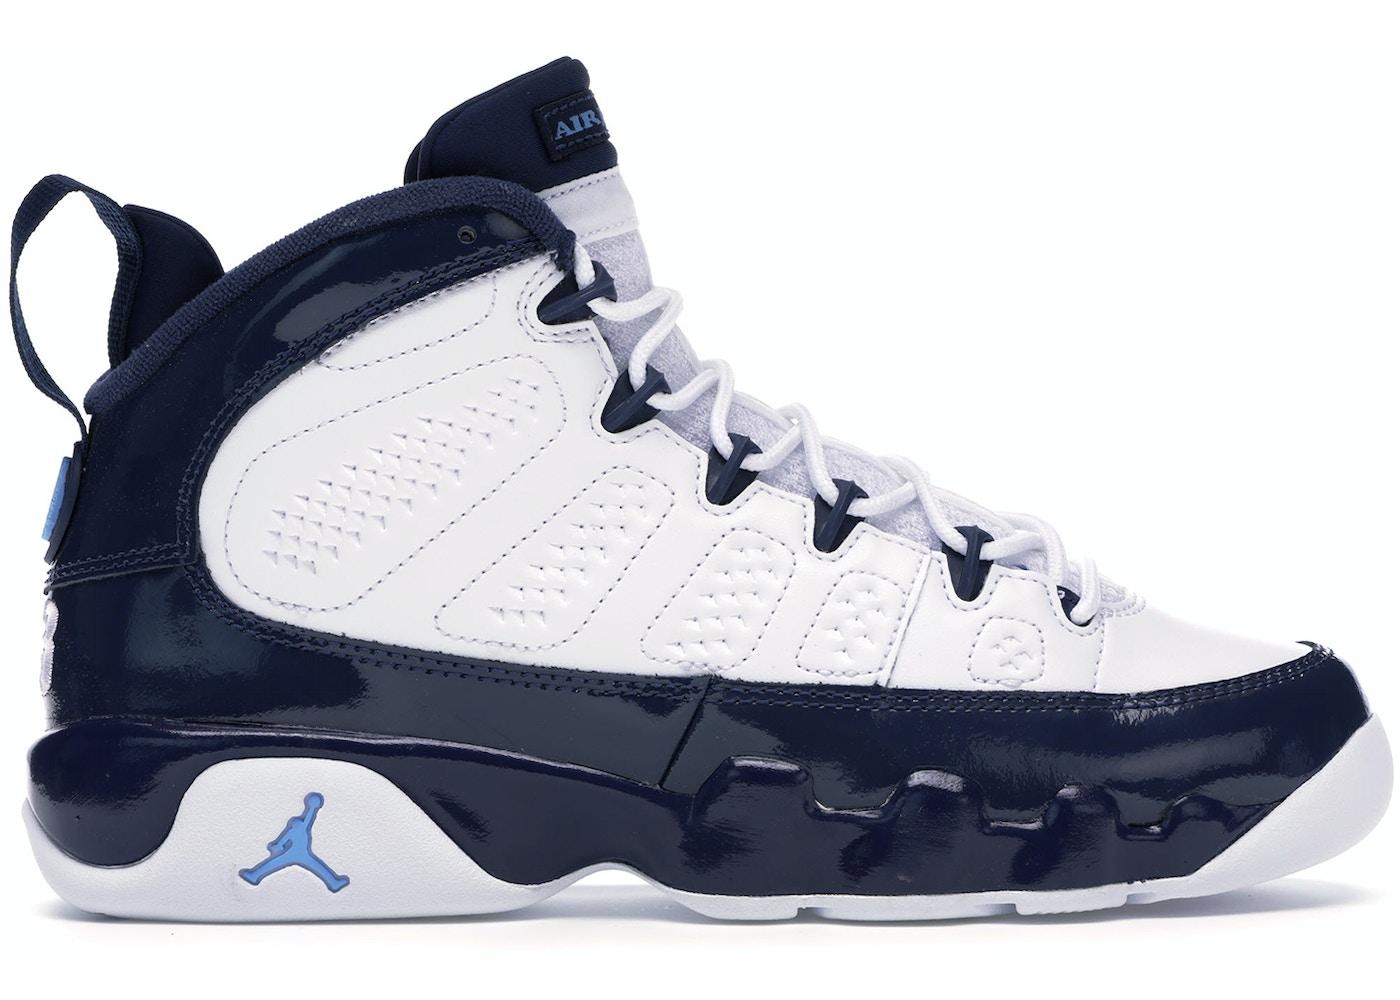 low priced 58fb2 23b69 Jordan 9 Retro Pearl Blue (GS) - 302359-145